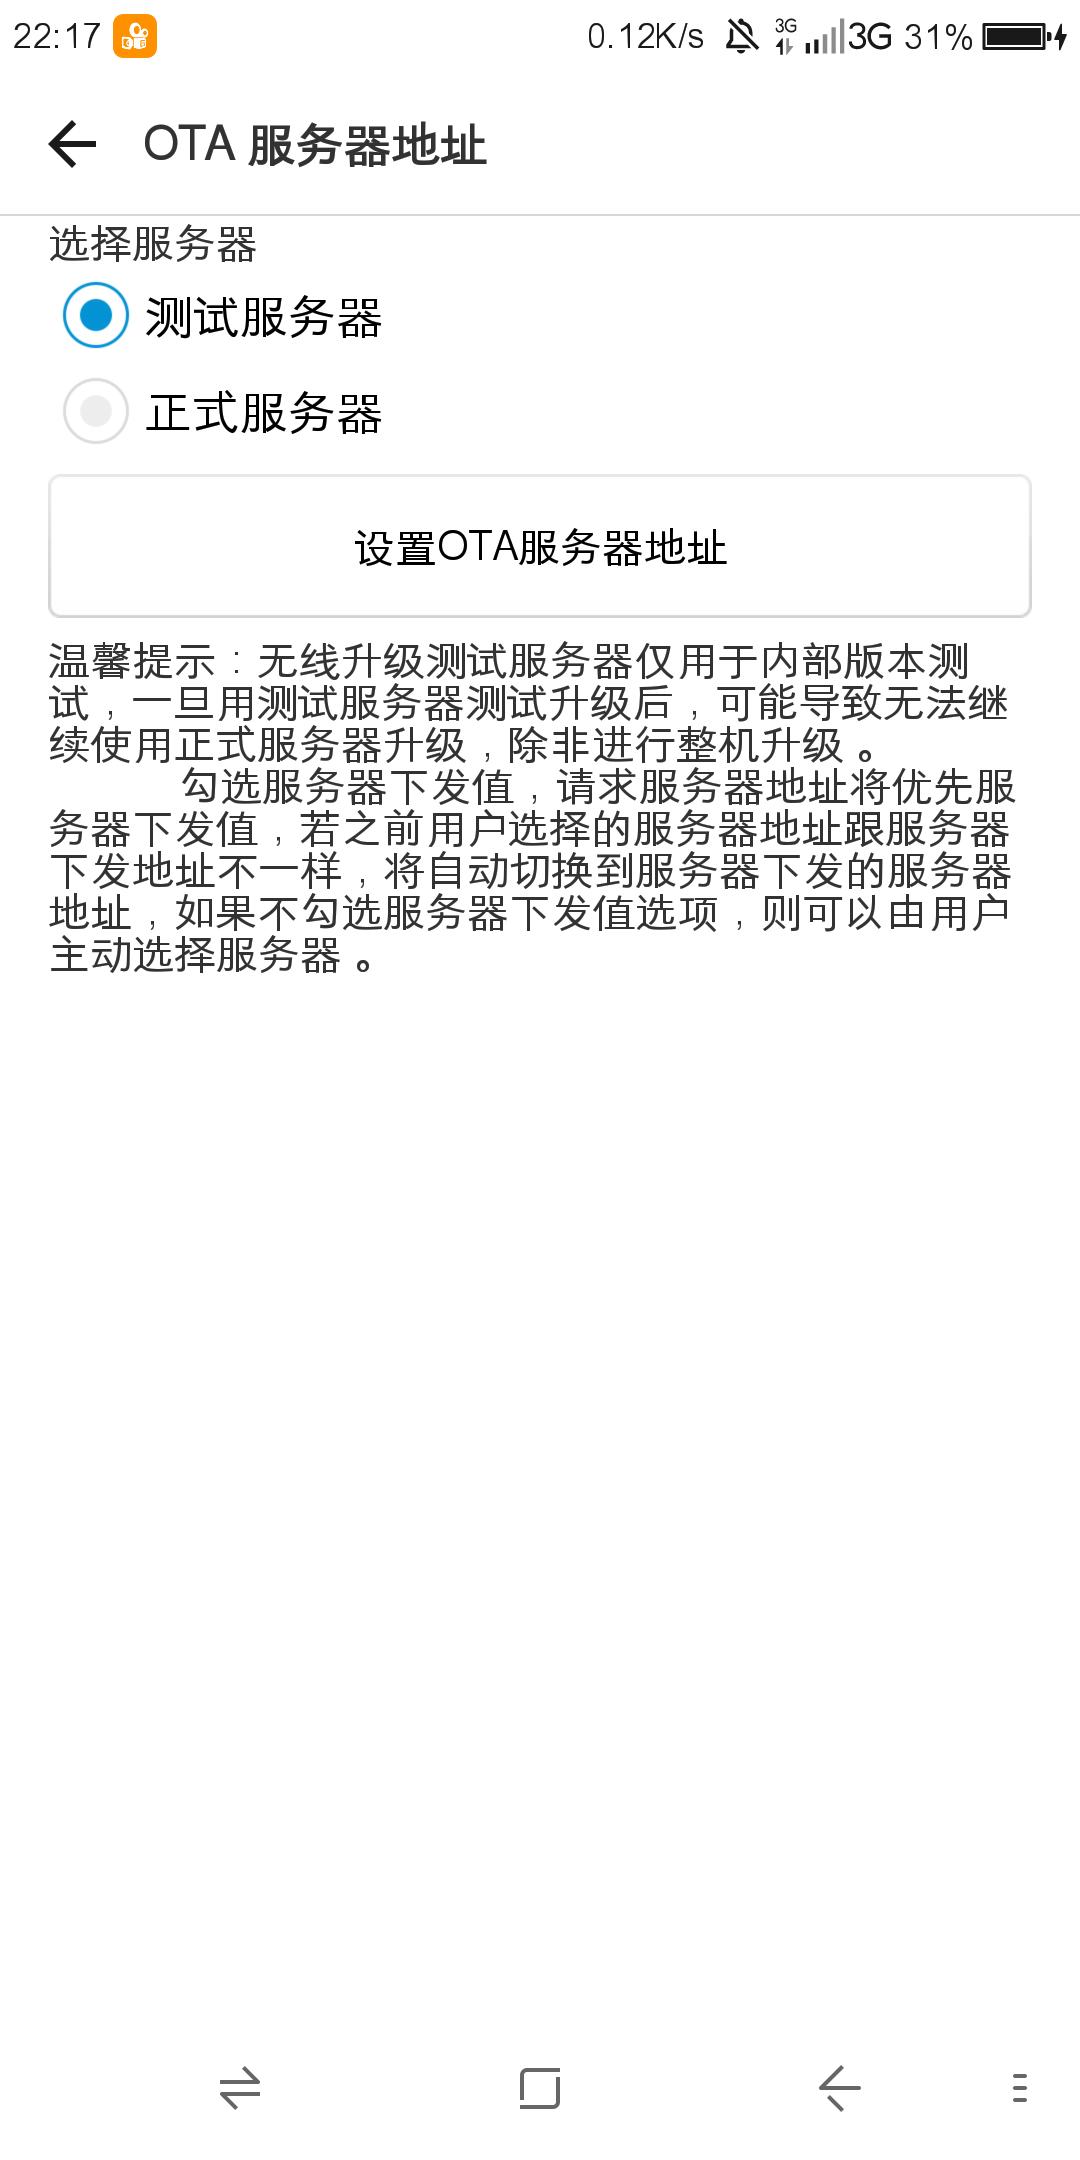 Screenshot_2019-02-25-22-17-43.png